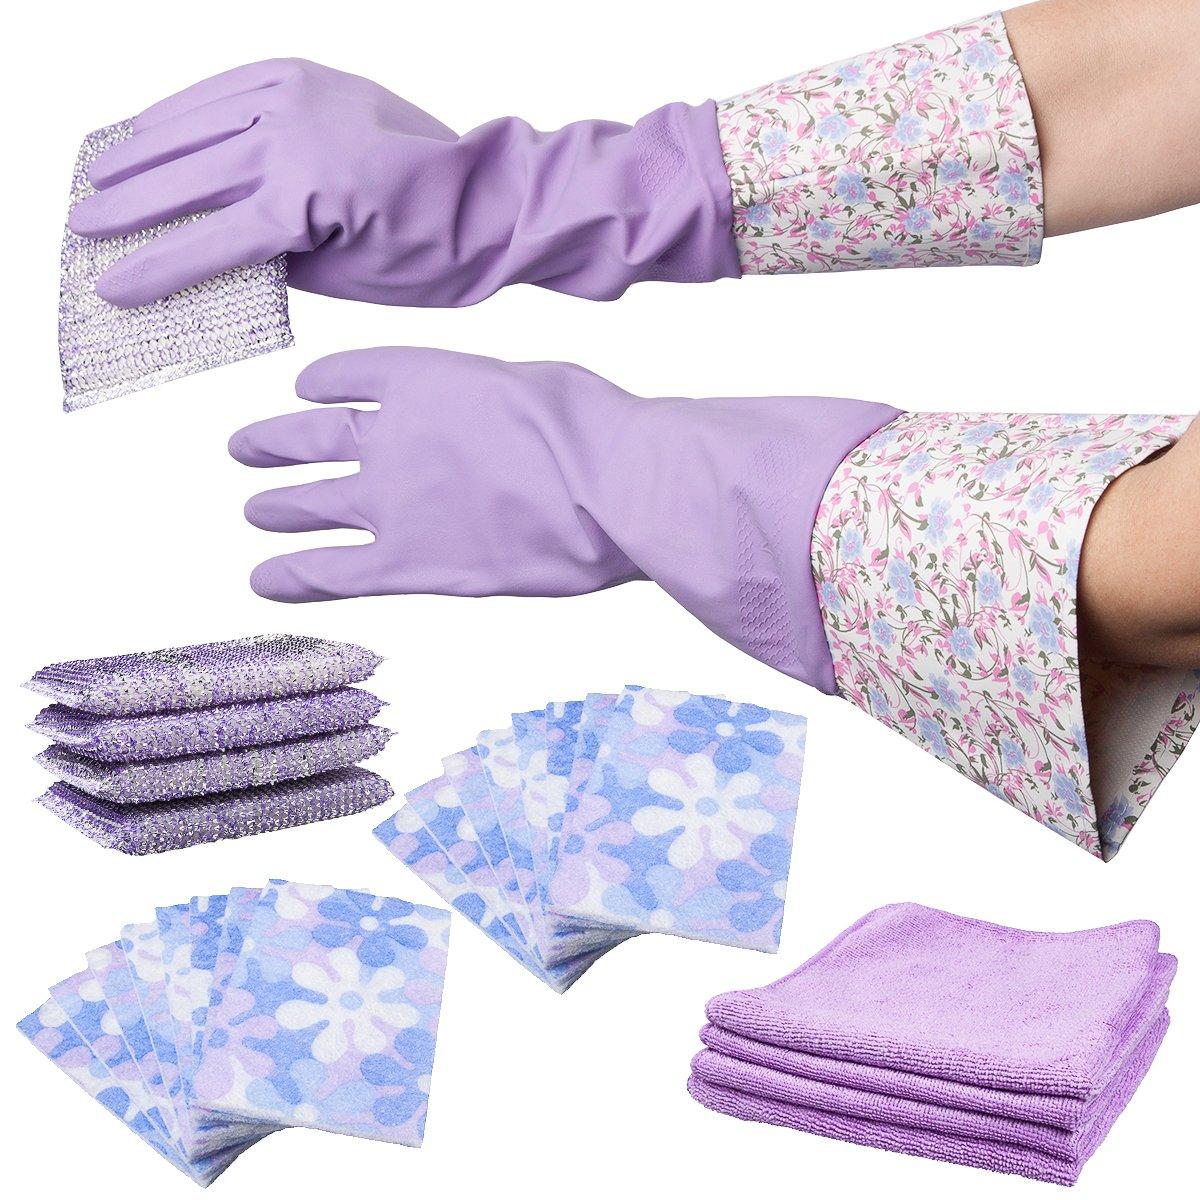 25pc Smart Home Purple Mega Cleaning Set - Sponges, Microfiber Cloths, Gloves by Smart home B015EI6UC4